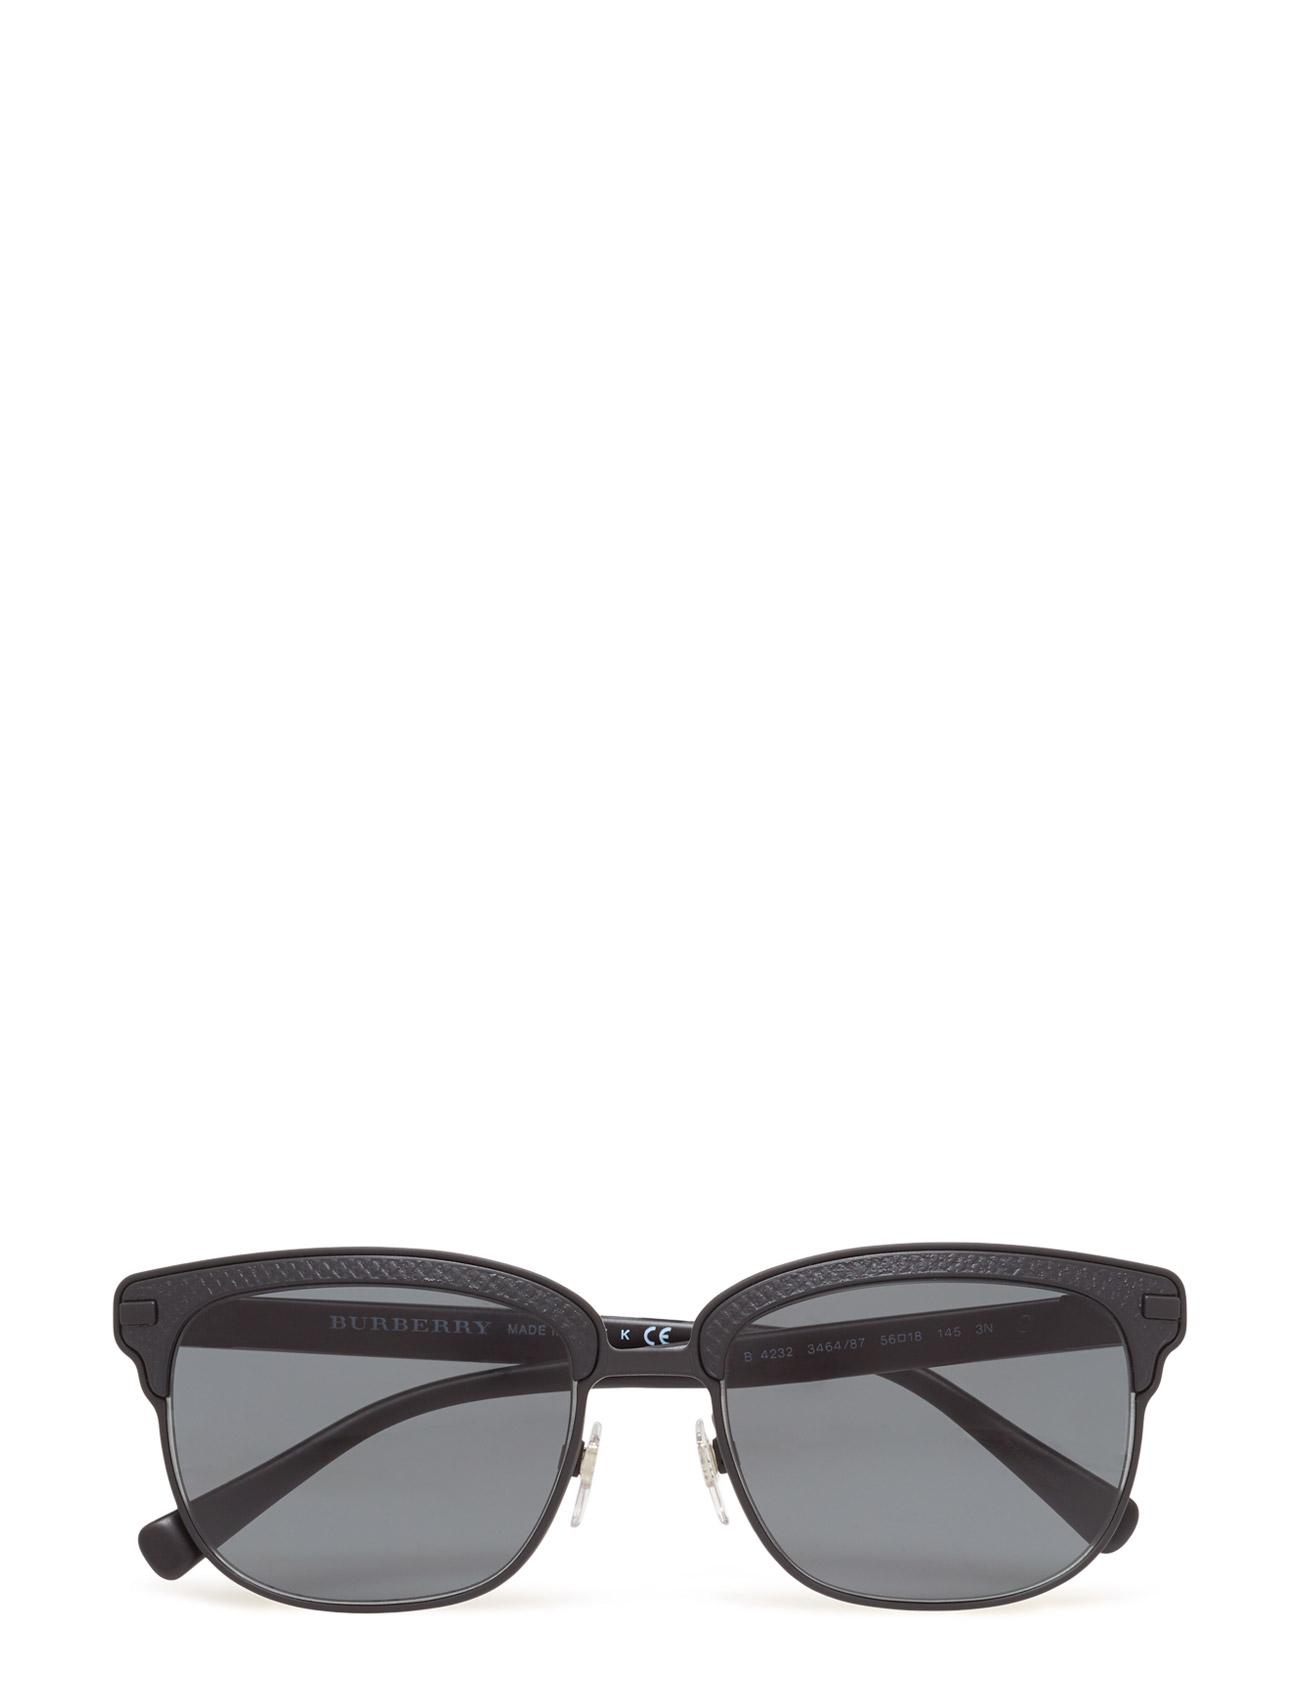 D-Frame Burberry Sunglasses Solbriller til Herrer i